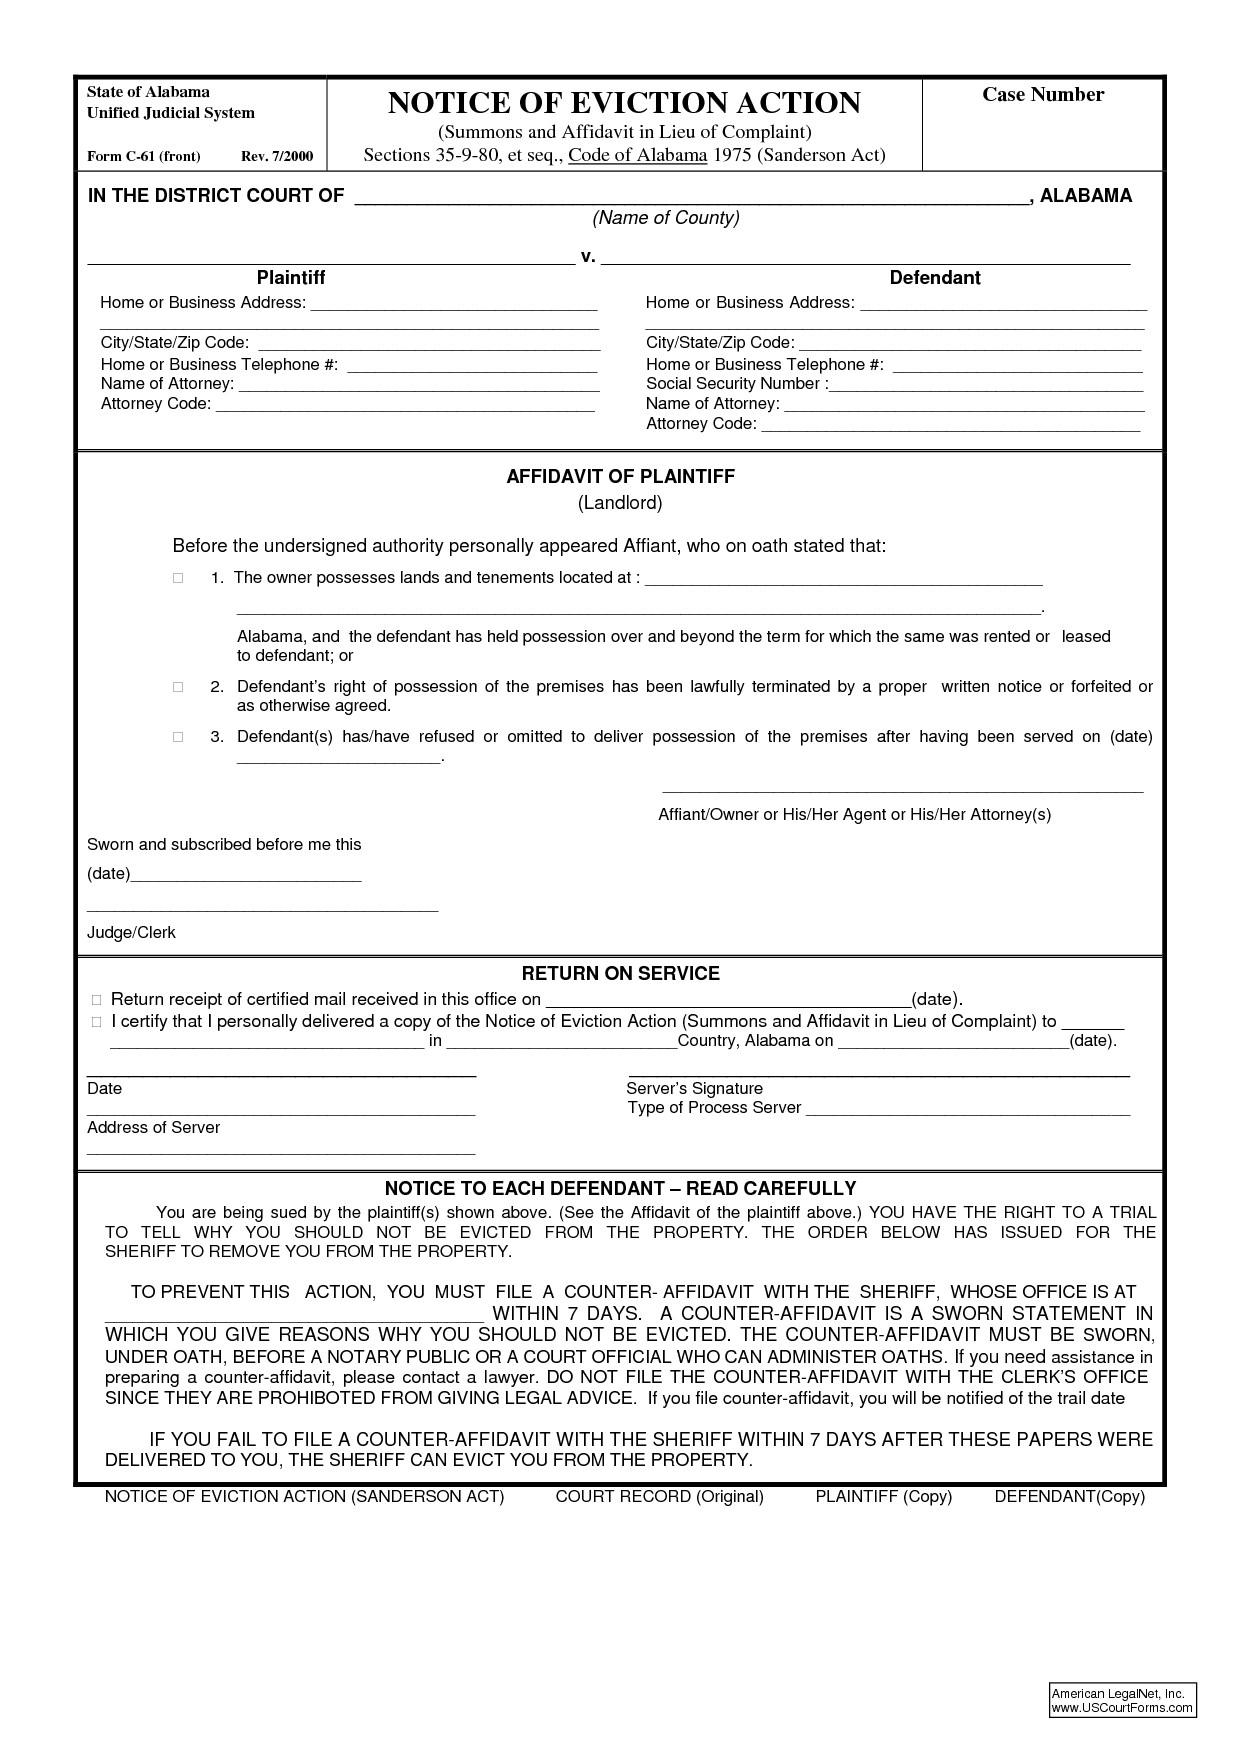 Eviction Notice Template Alabama Alabama 7 Day Eviction Notice Ideas